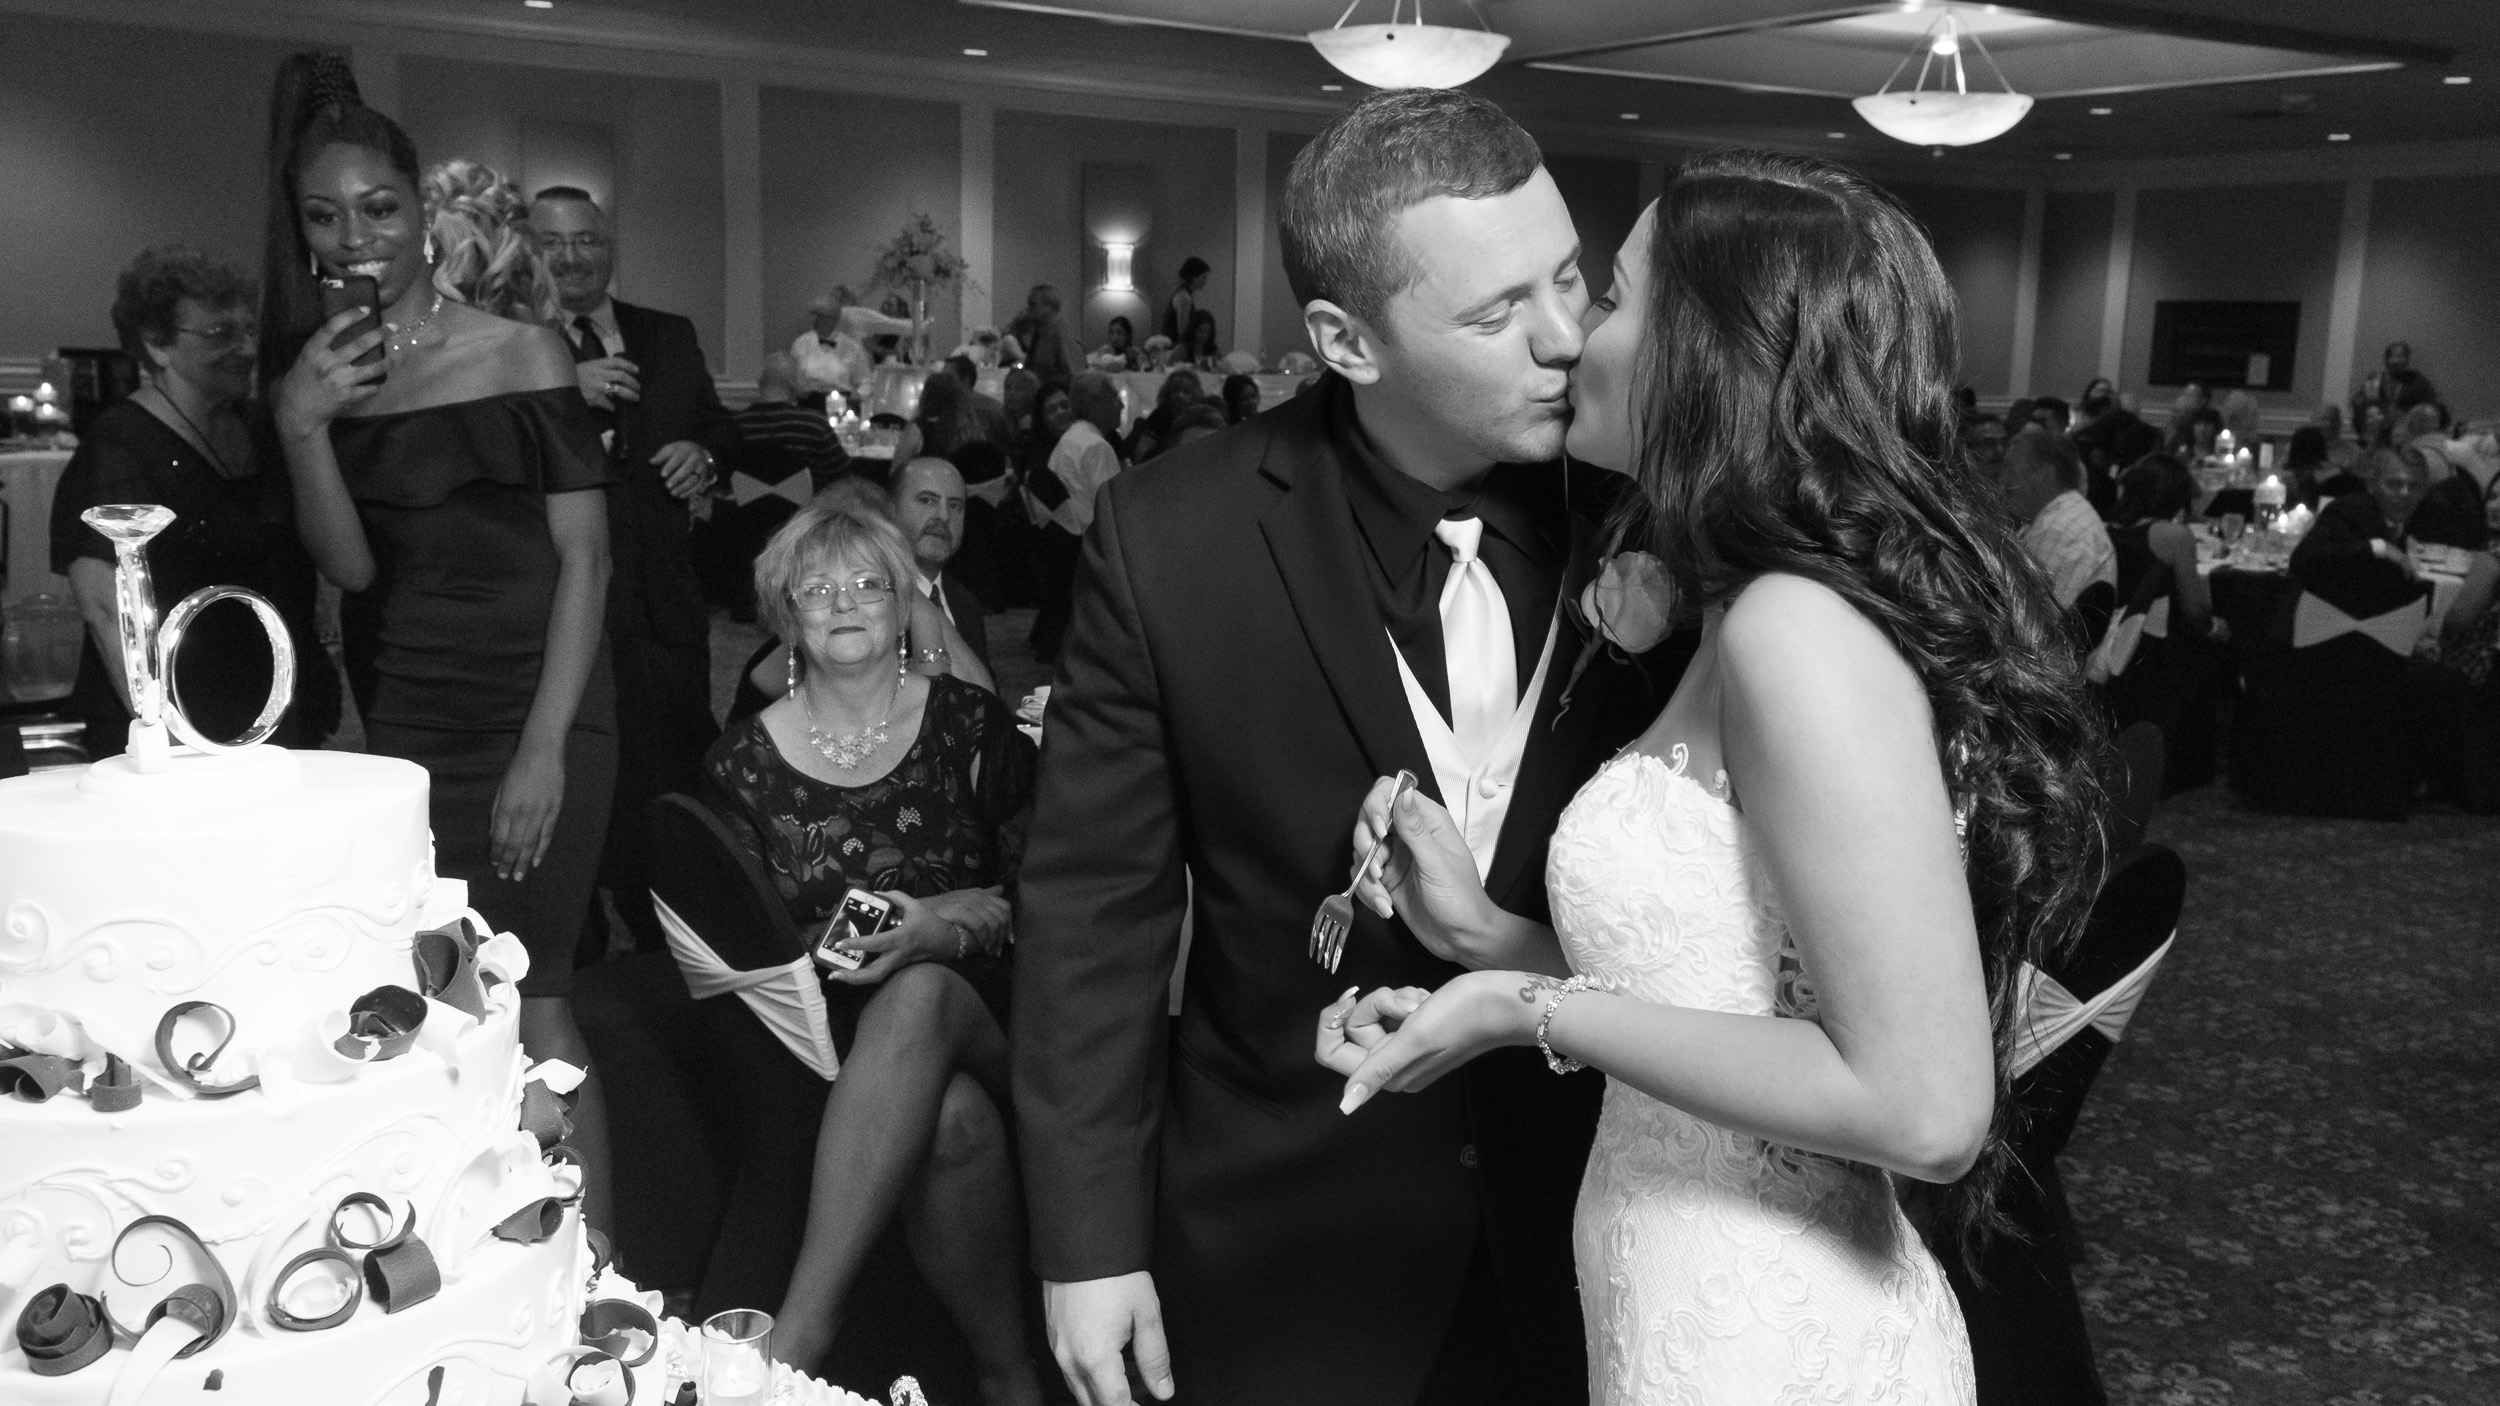 Bride-and-groom-cutting-cake-2.jpg